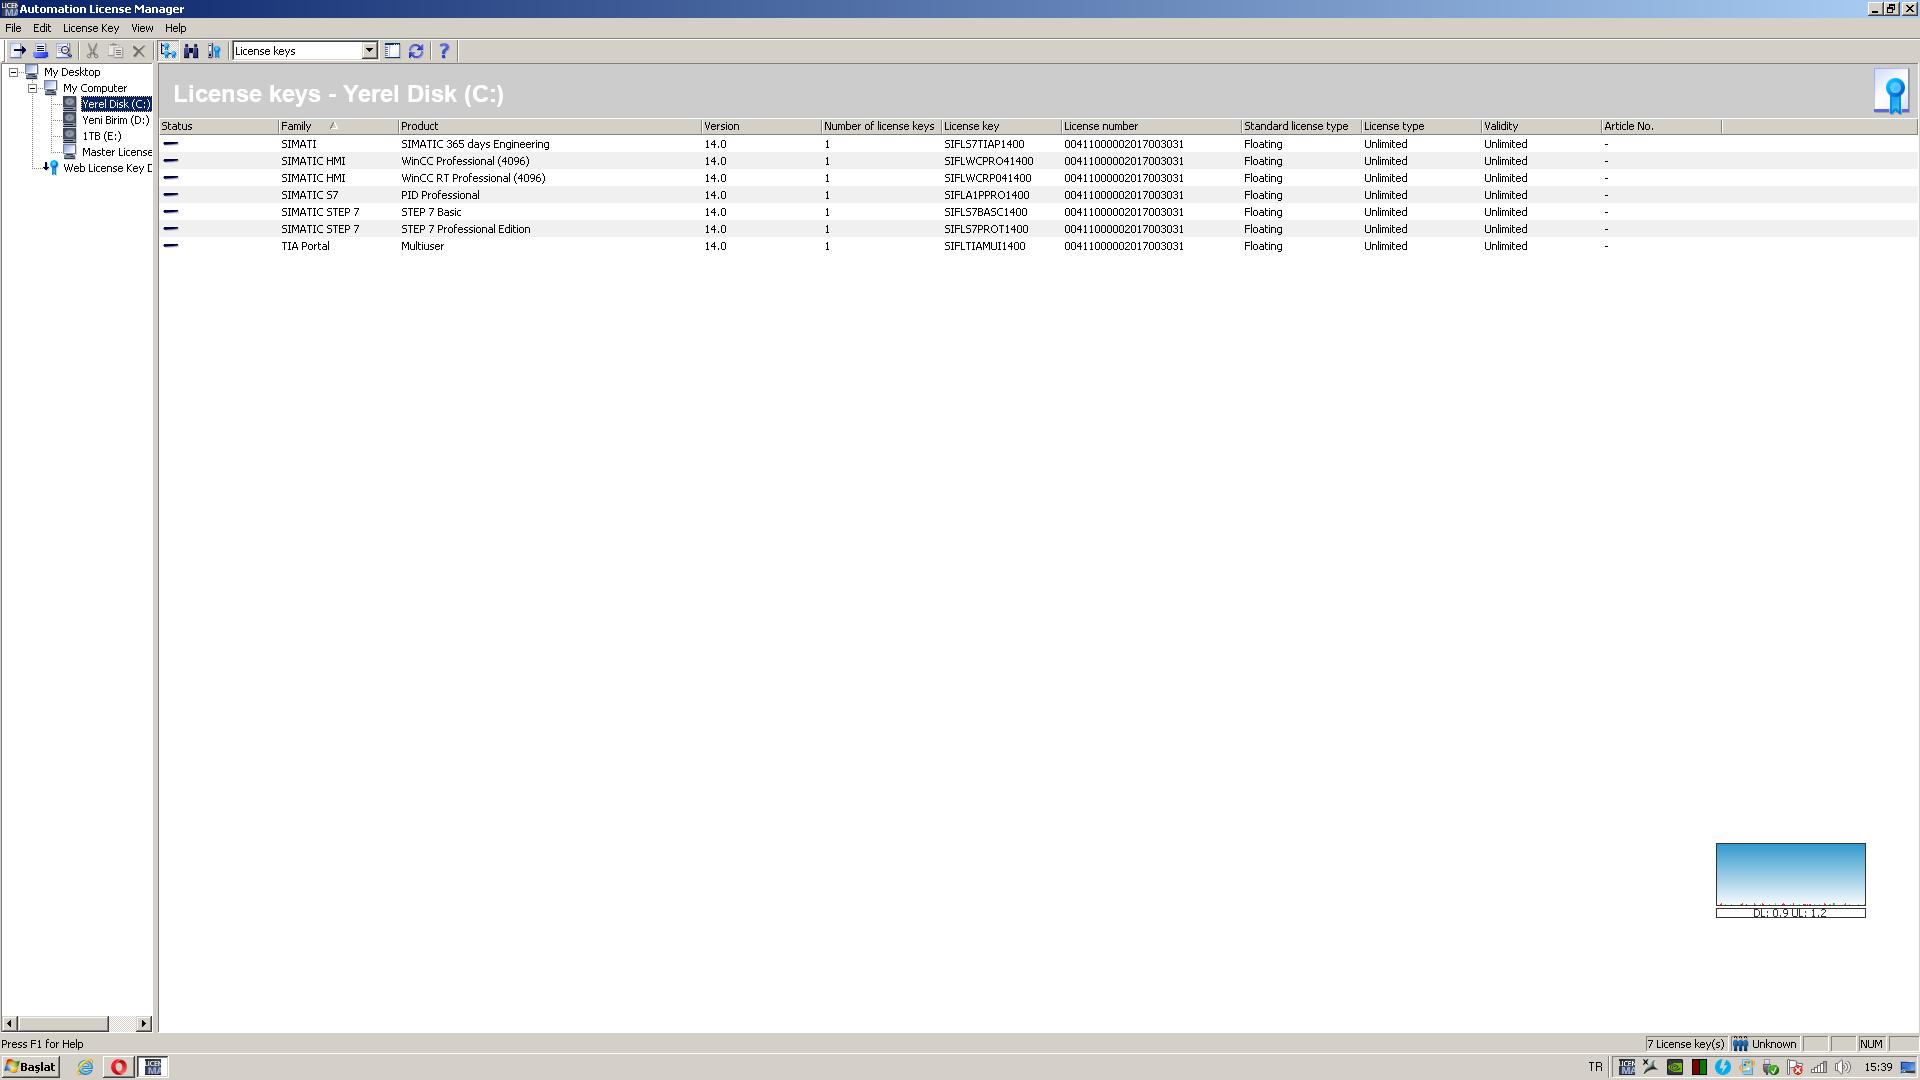 TİA PORTAL V14 Wincc runtime professional buton aktif olmuyor